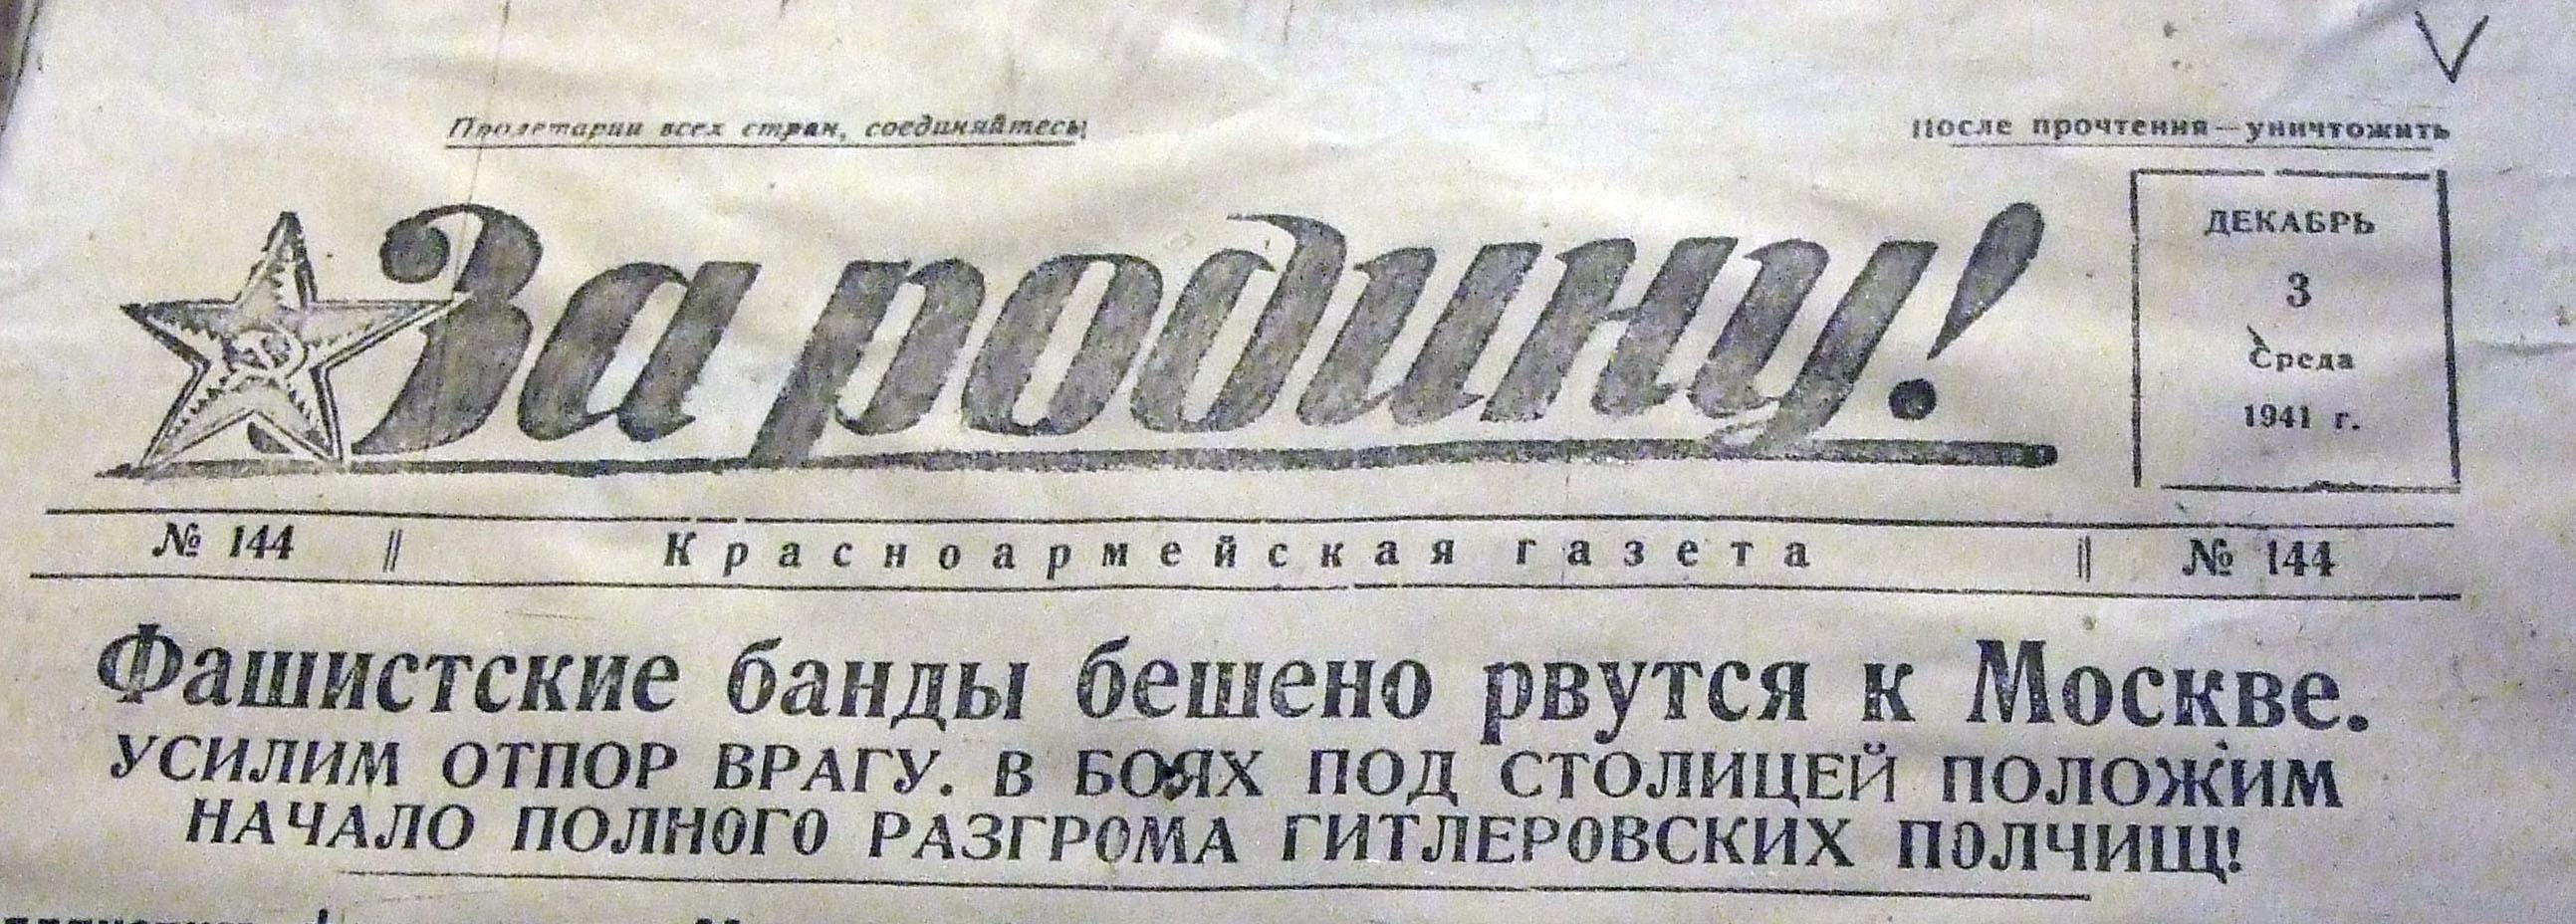 http://s1.uploads.ru/WY1Po.jpg